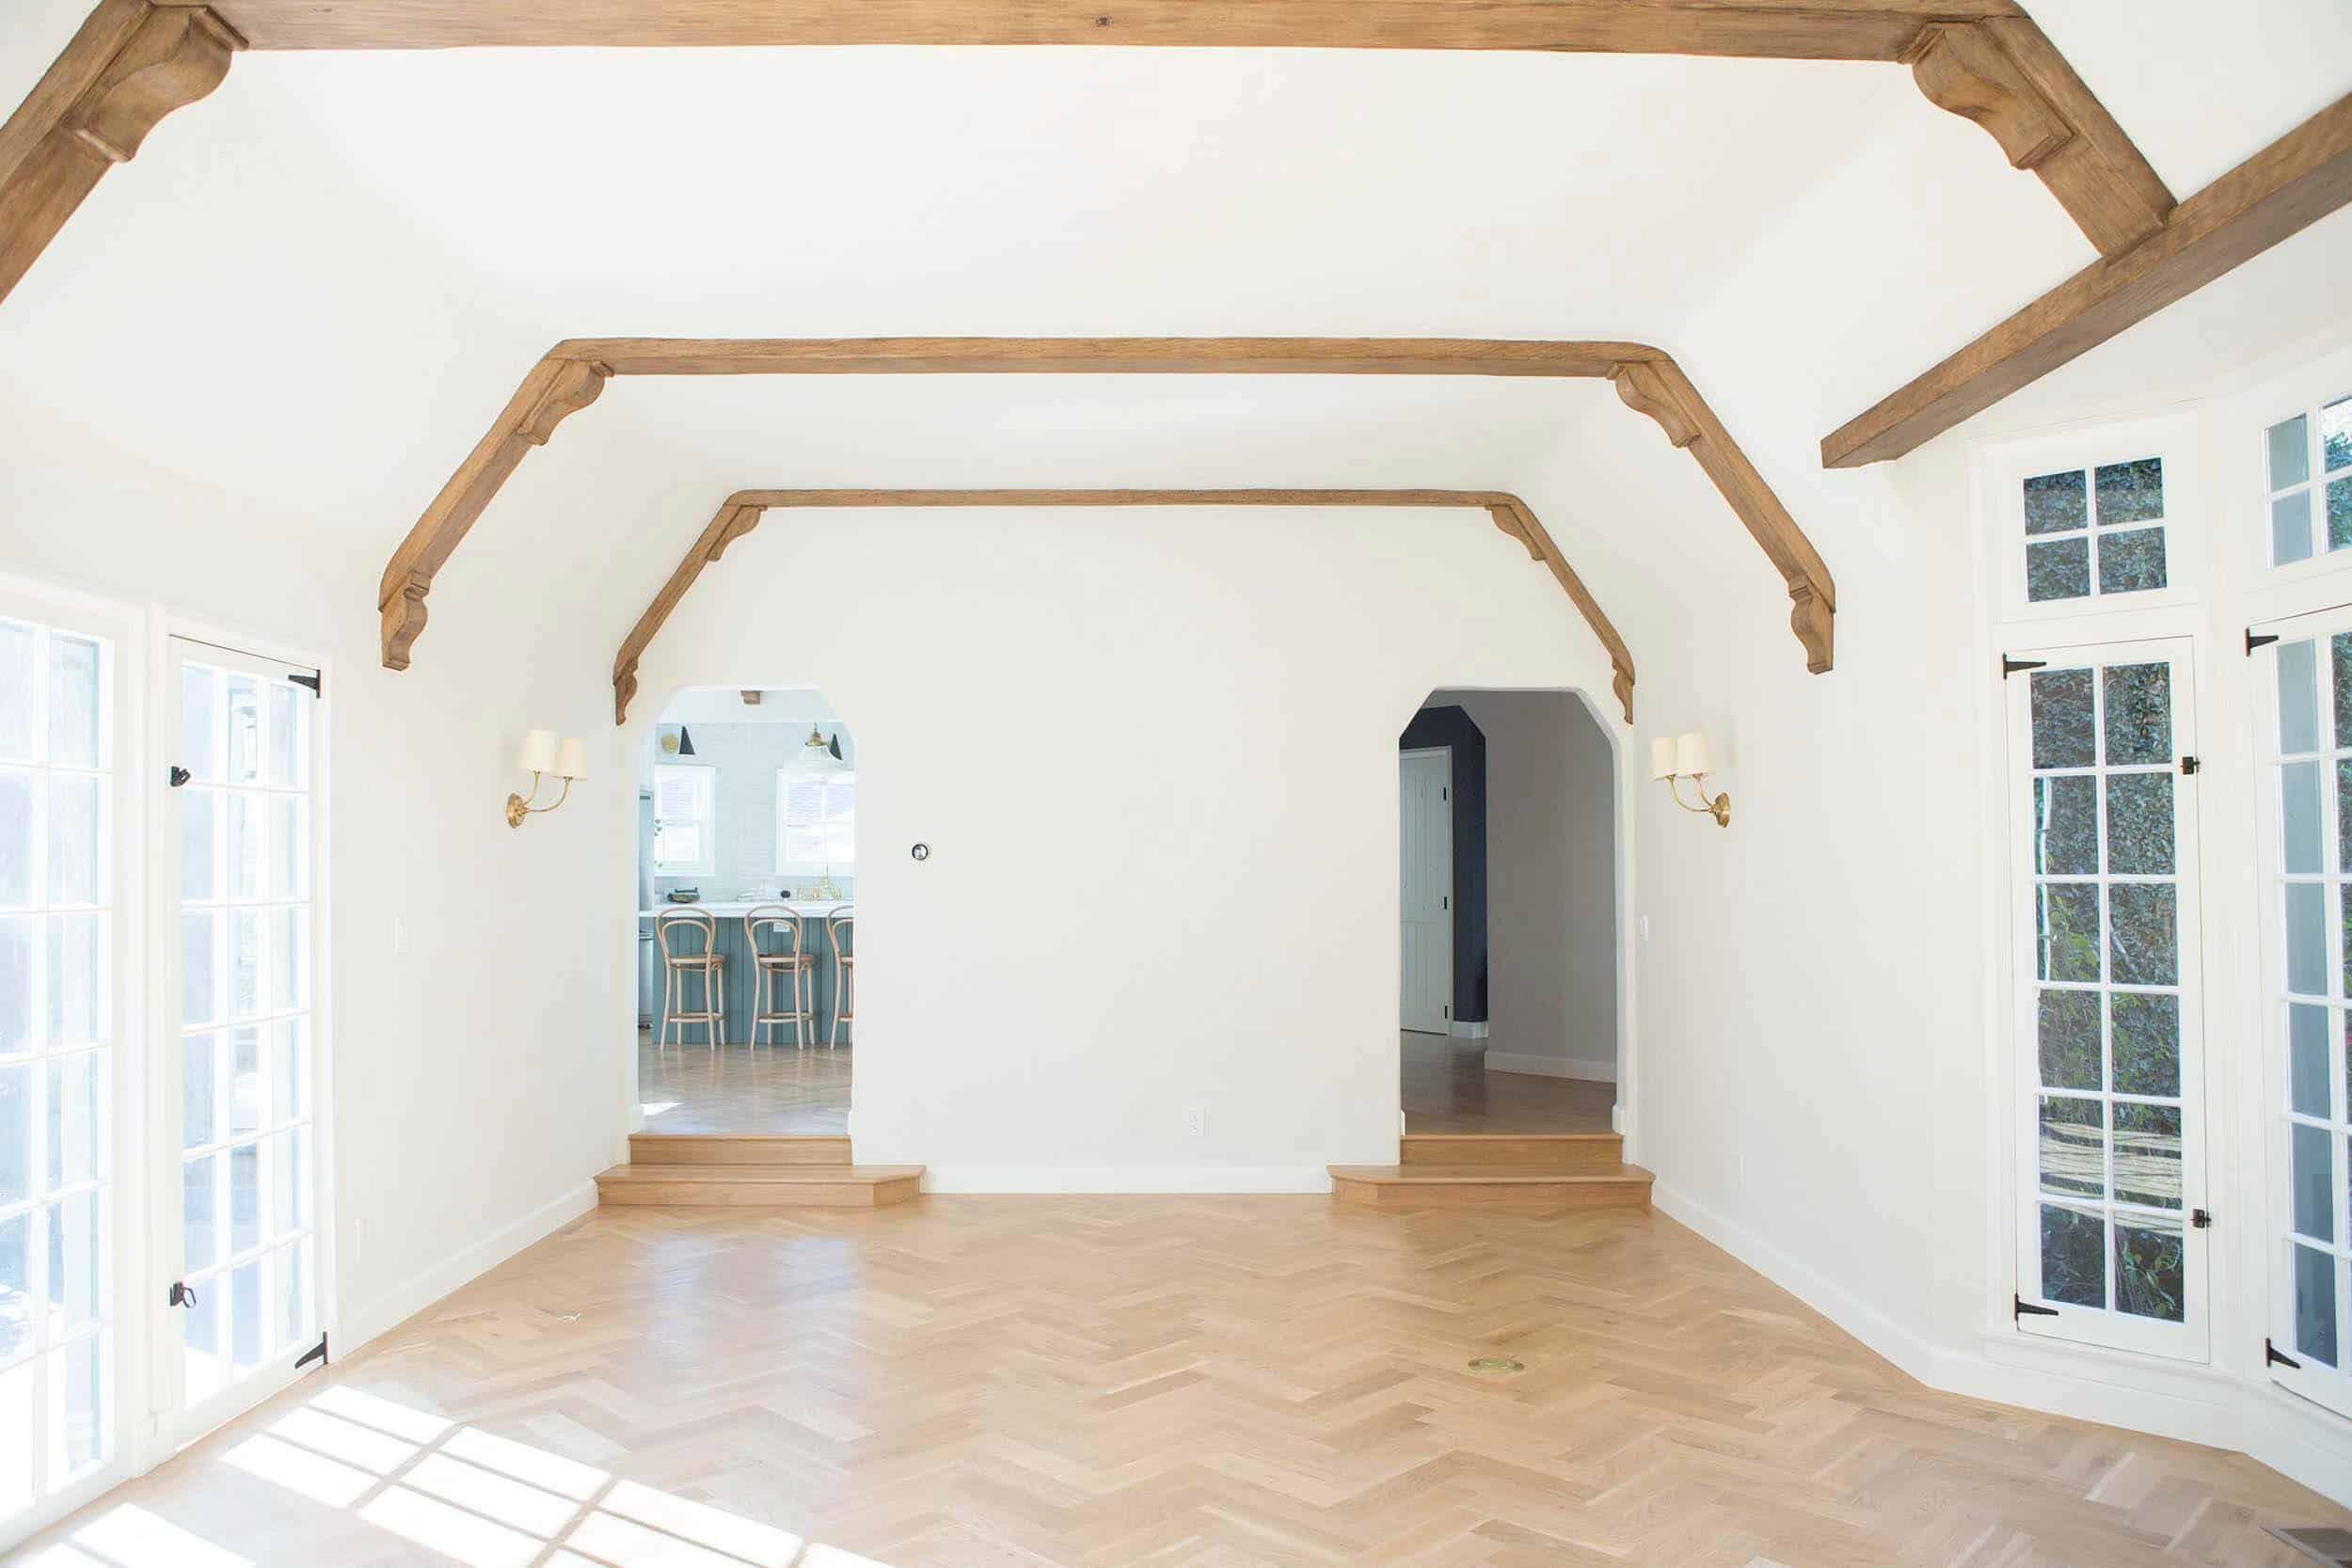 Emily_Henderson_Living_Room_Progress_Wood_Floors_No Text